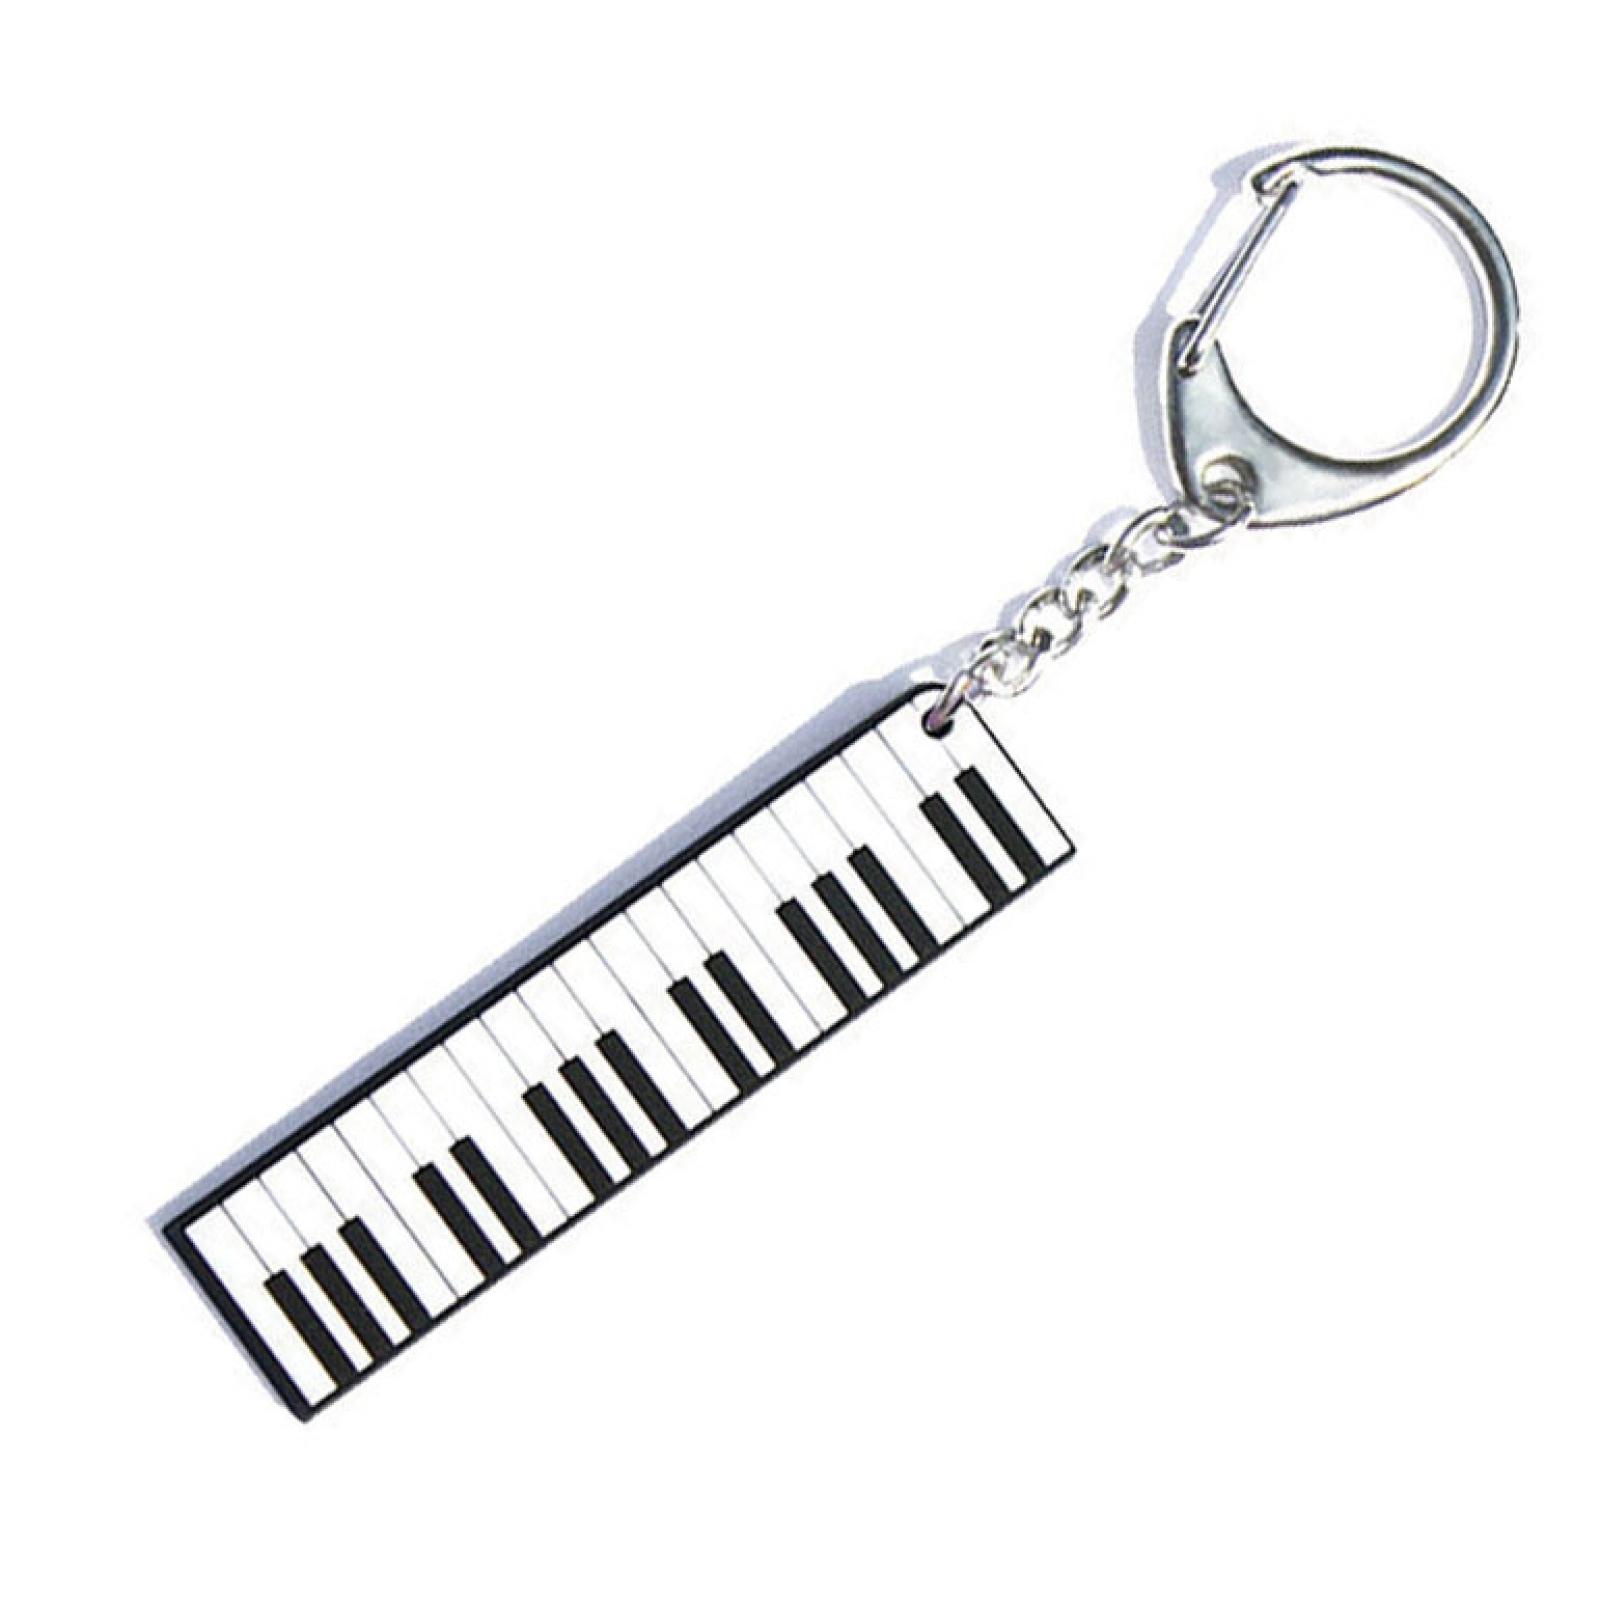 Hot House Pvc Piano Keyring